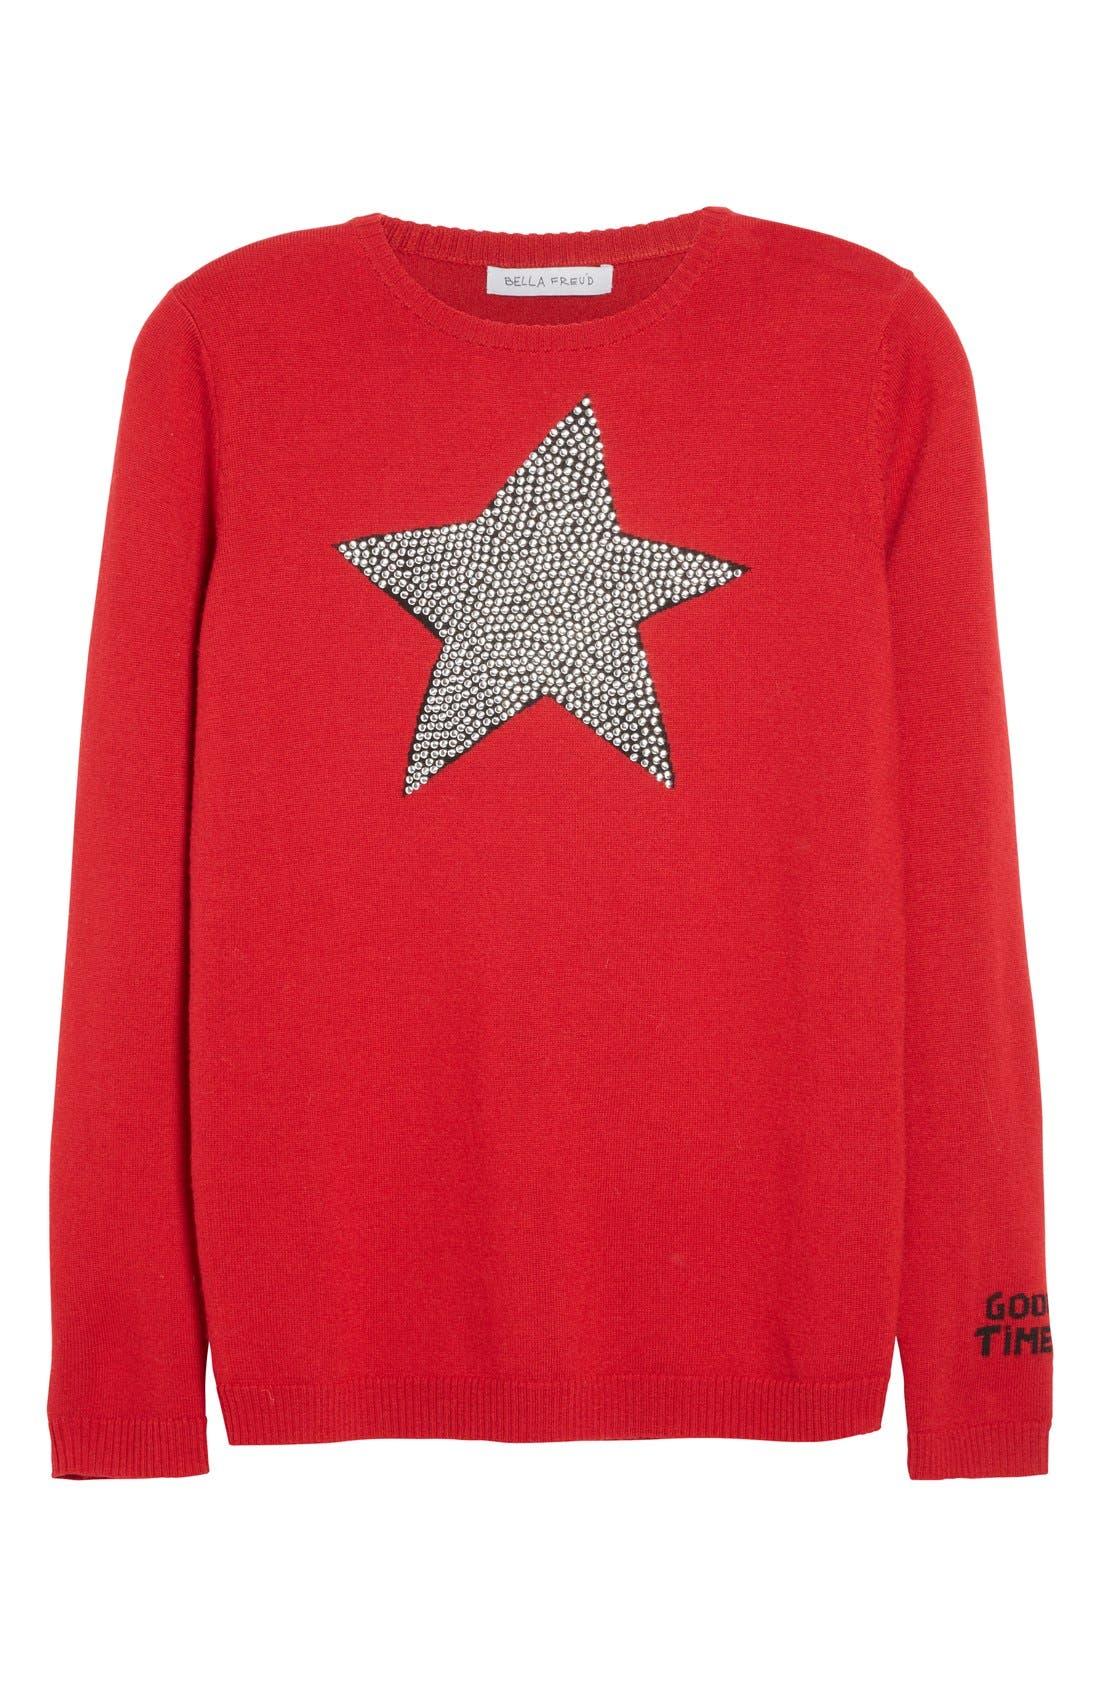 Alternate Image 4  - Bella Freud 'Star Studded' Crewneck Wool Sweater